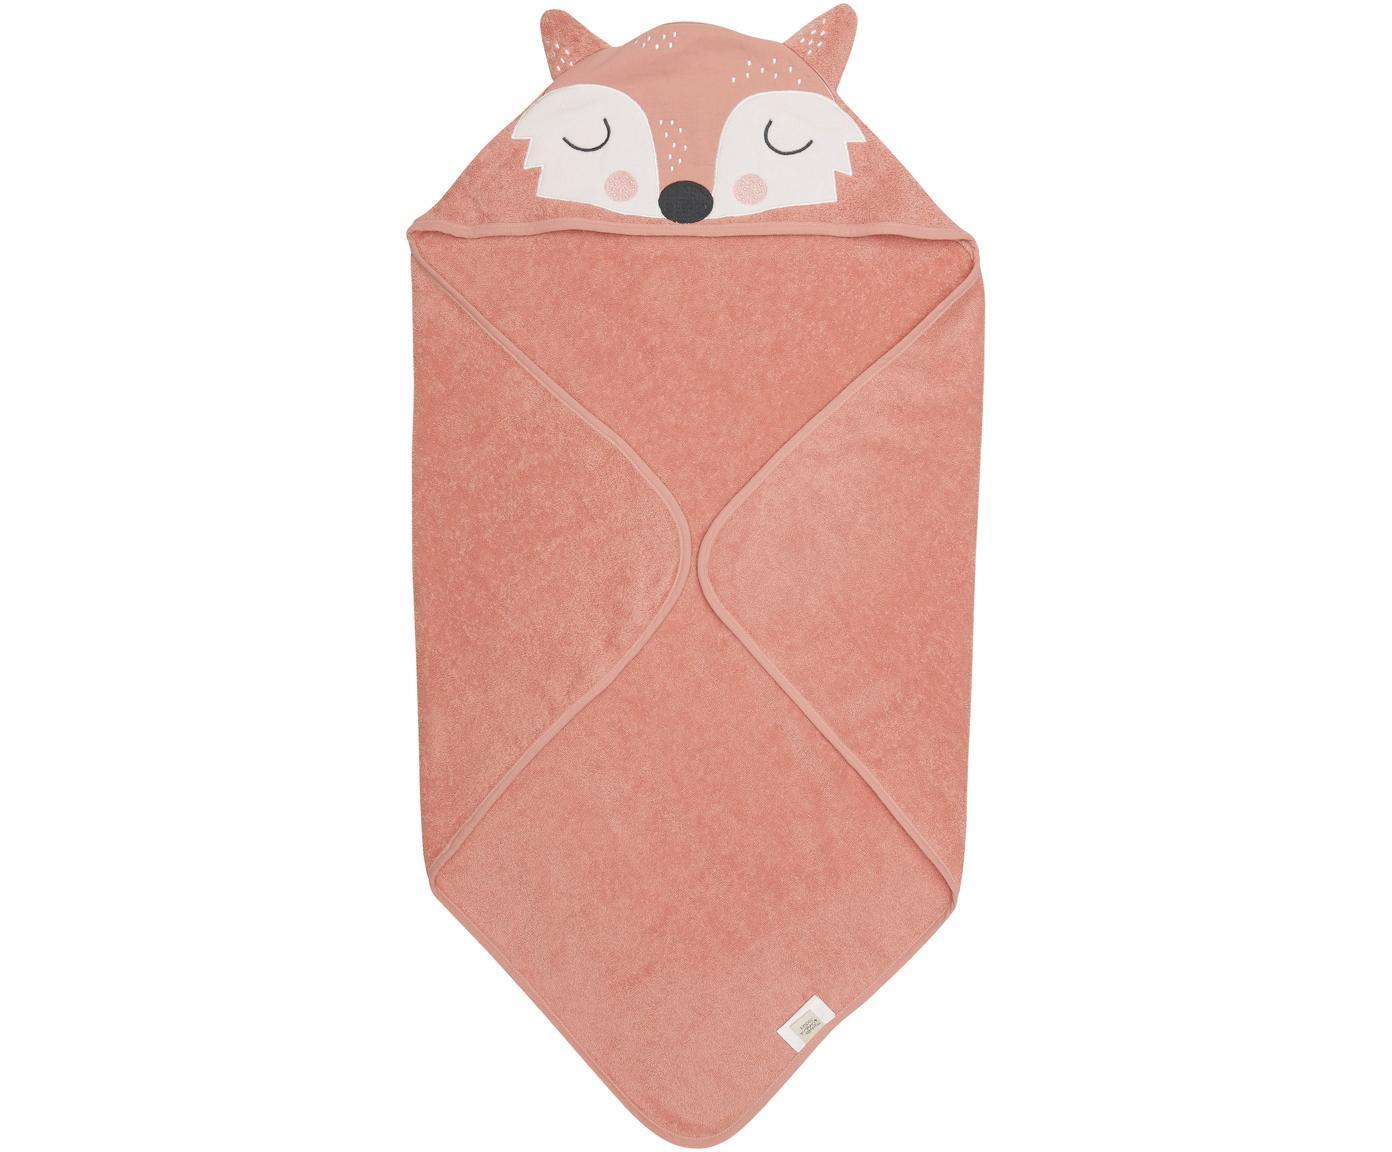 Babyhanddoek Fox Frida, Organisch katoen, GOTS-gecertificeerd, Roze, wit, zwart, 80 x 80 cm